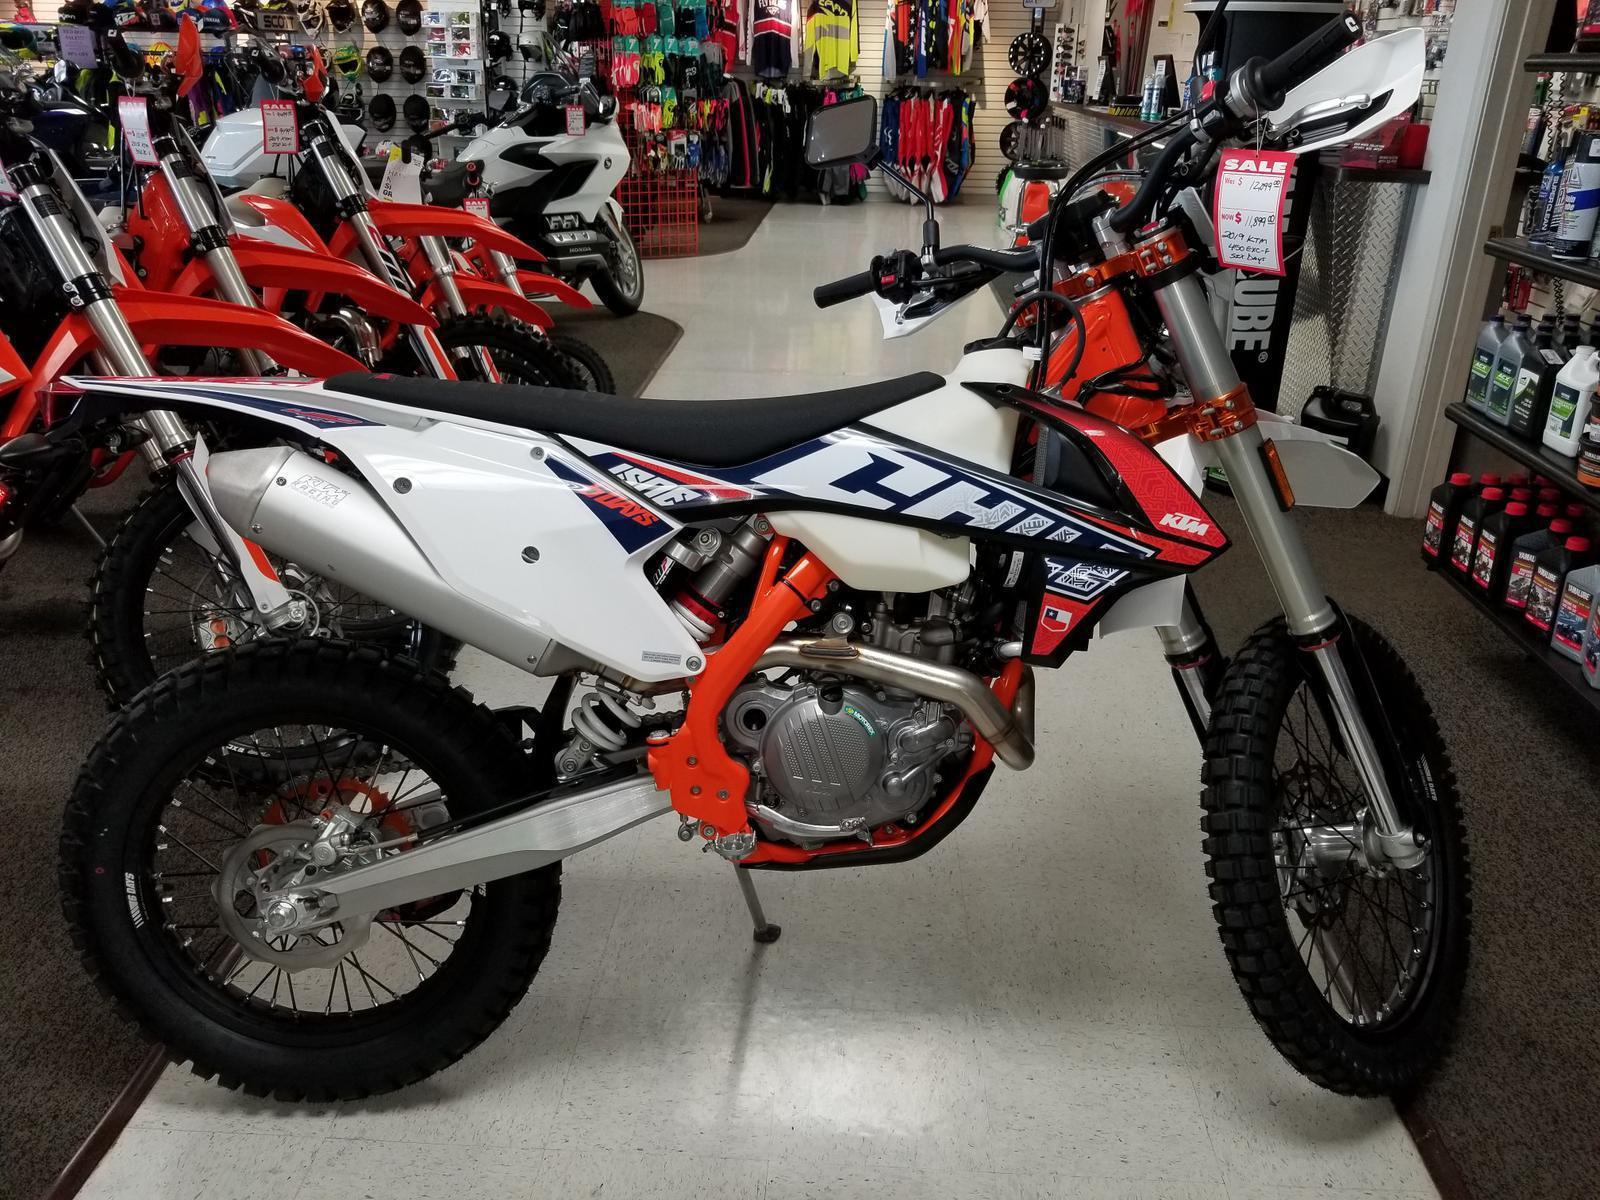 inventory adventure motorsports twin falls, id (208) 733 5072Honda Recon Fuel Filter Location #15